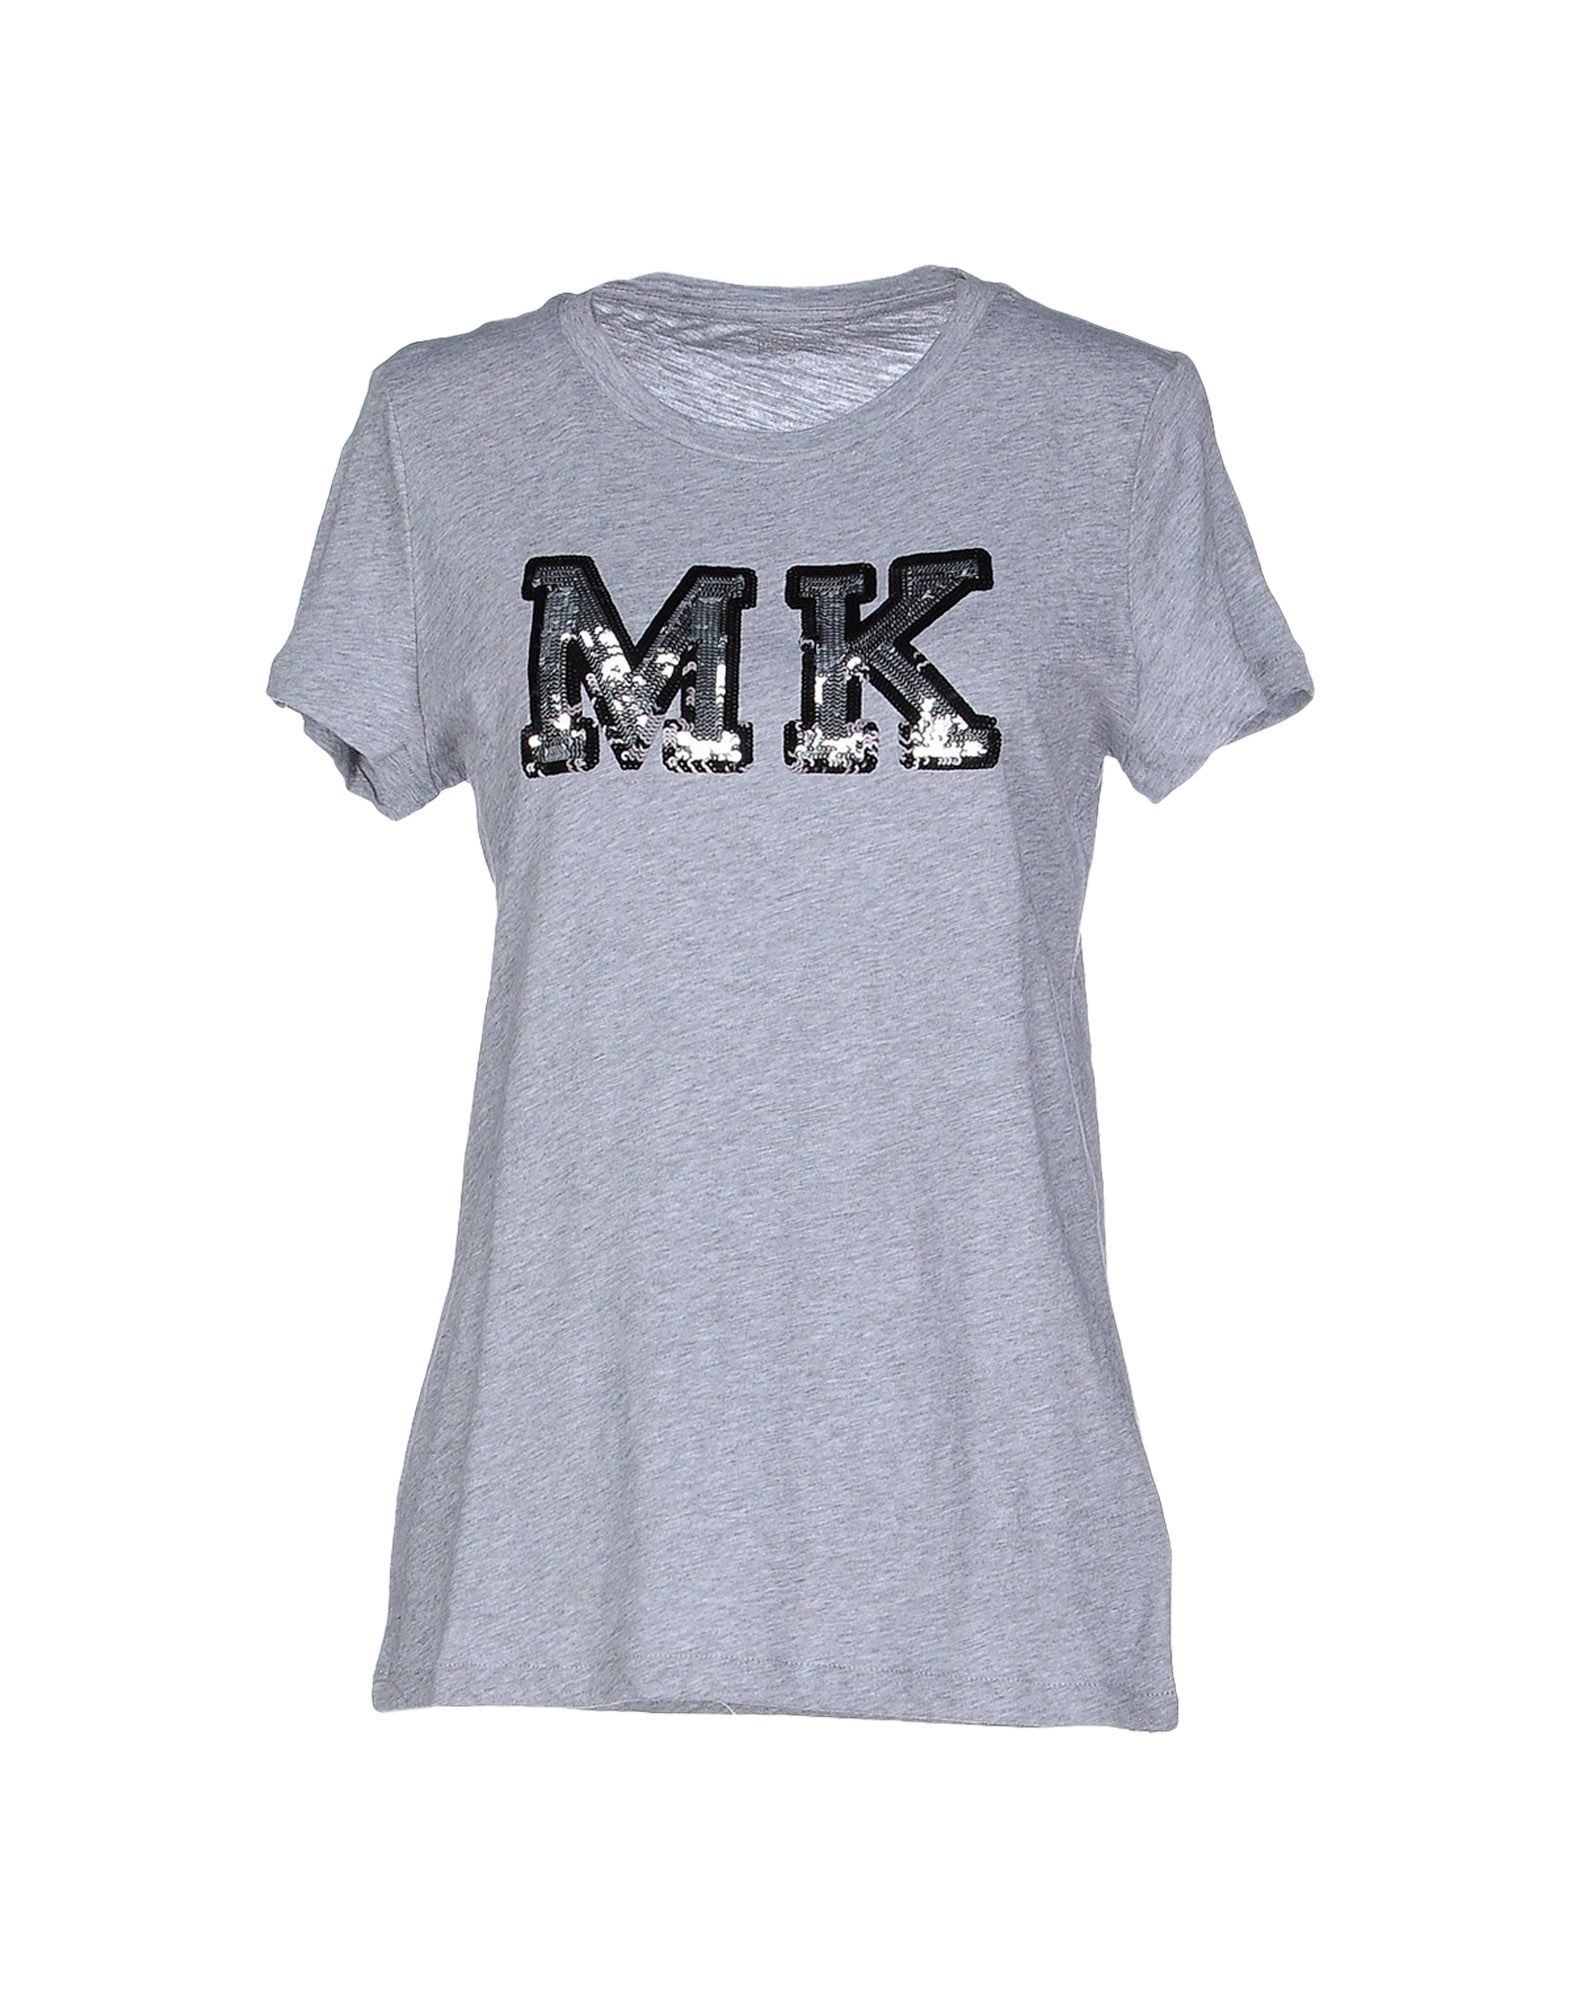 michael michael kors t shirt in gray lyst. Black Bedroom Furniture Sets. Home Design Ideas